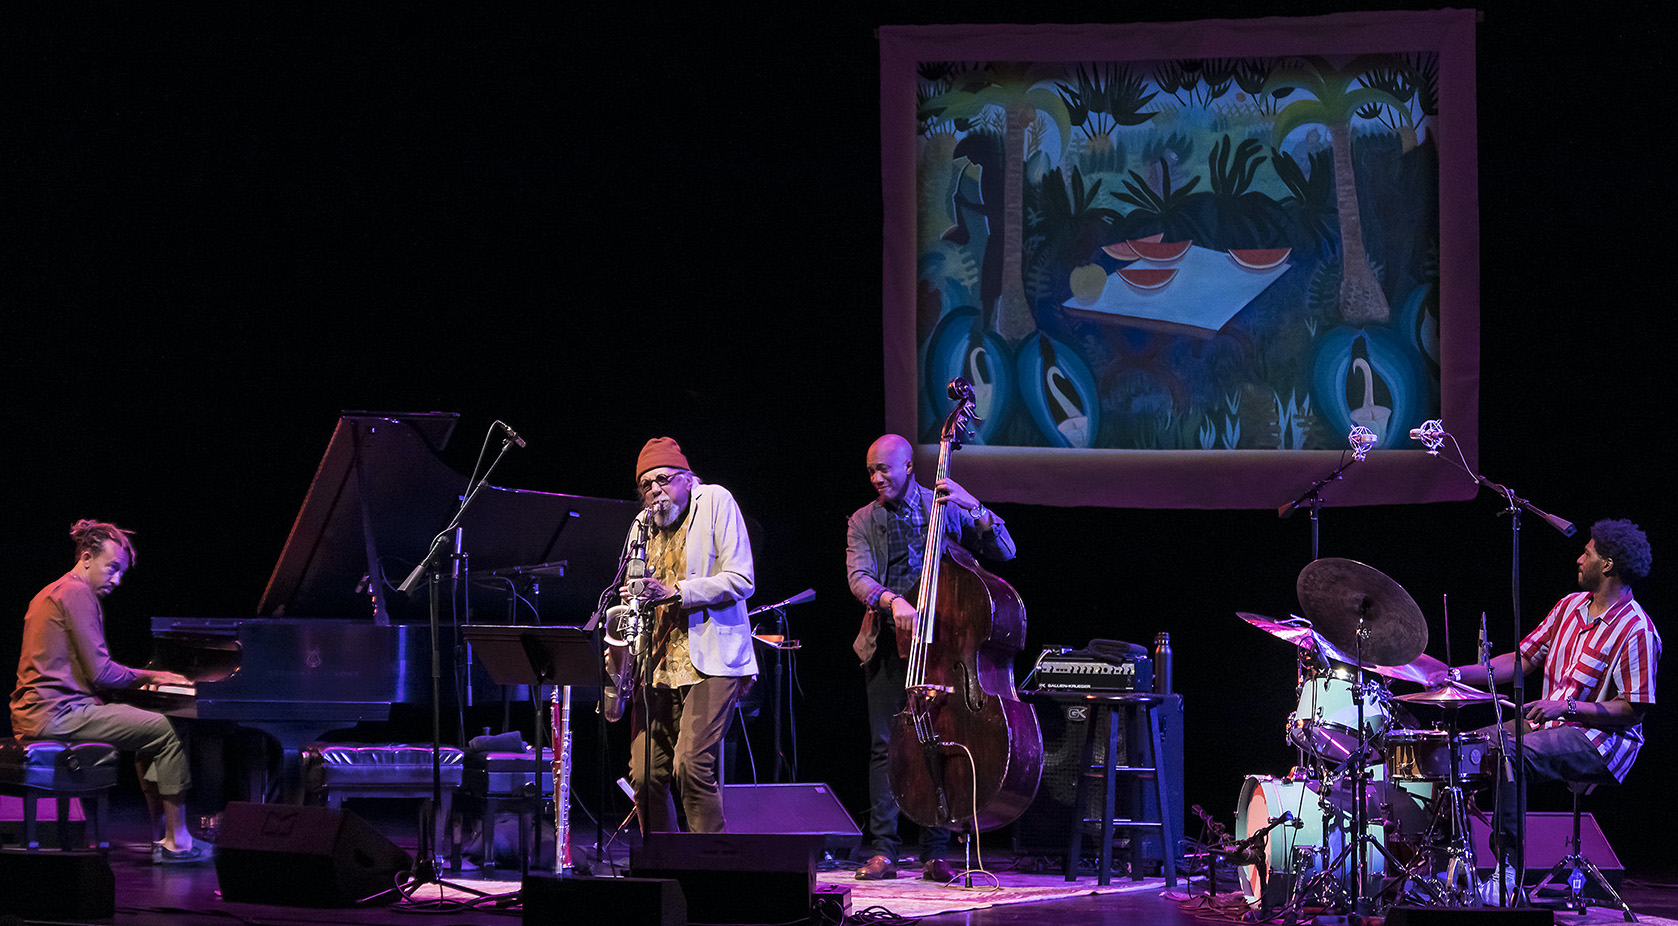 21_Charles_Lloyd_Quartet_at_the_Lobero_by_David_Bazemore_lo_res.jpg